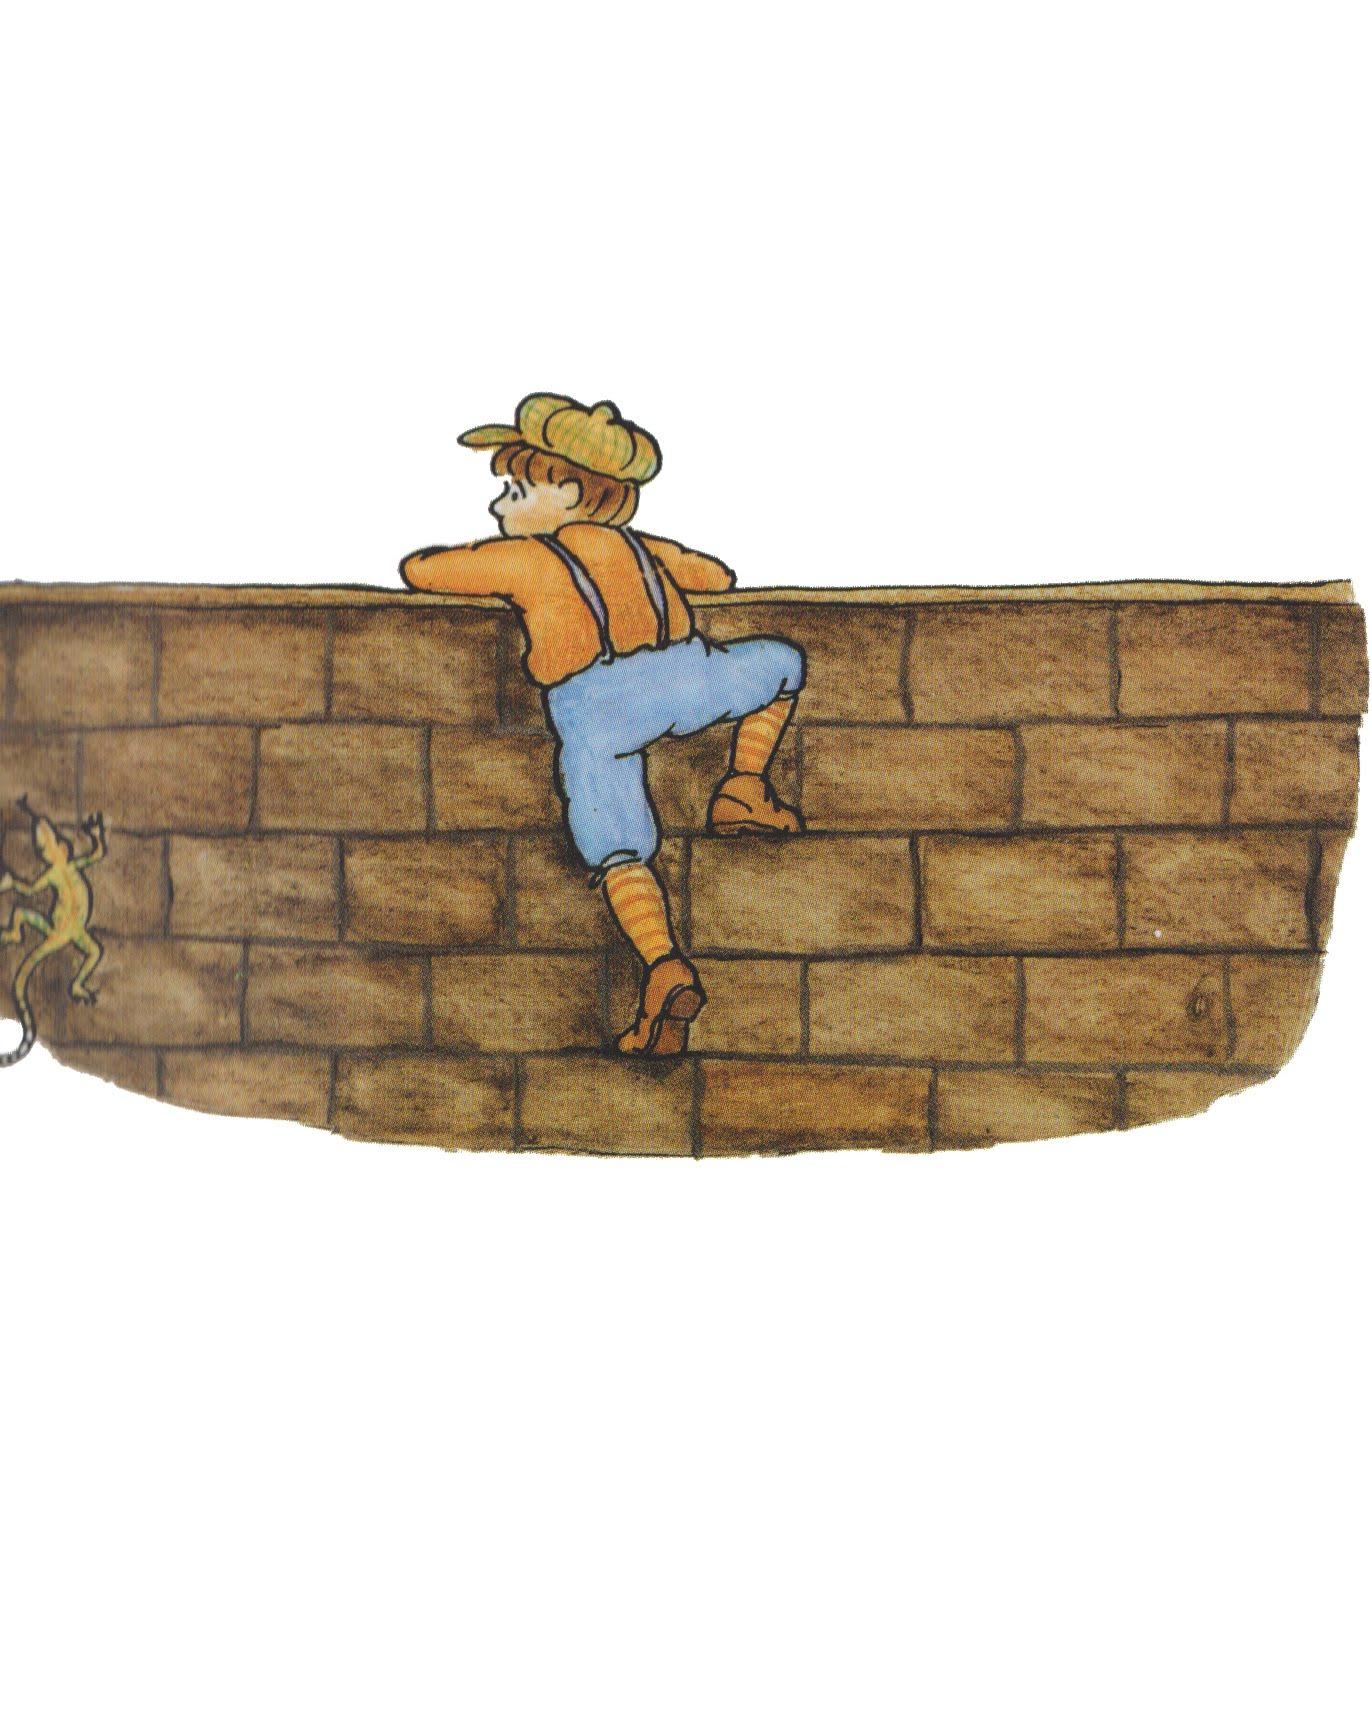 peeking over the wall - YouTube